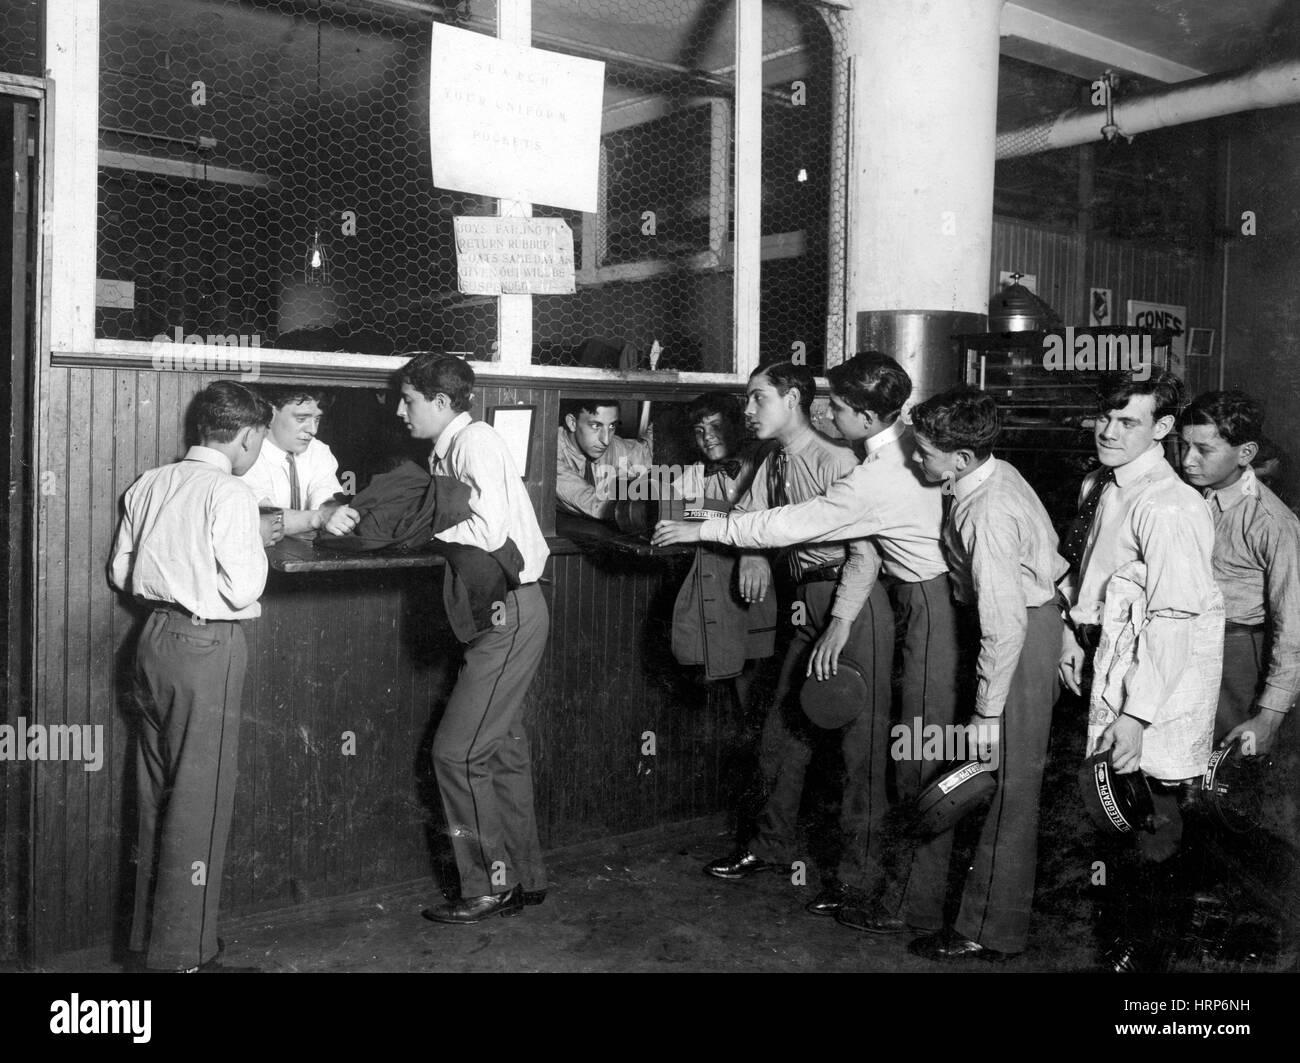 Postal Telegraph Messengers, Lewis Hine, 1910 - Stock Image